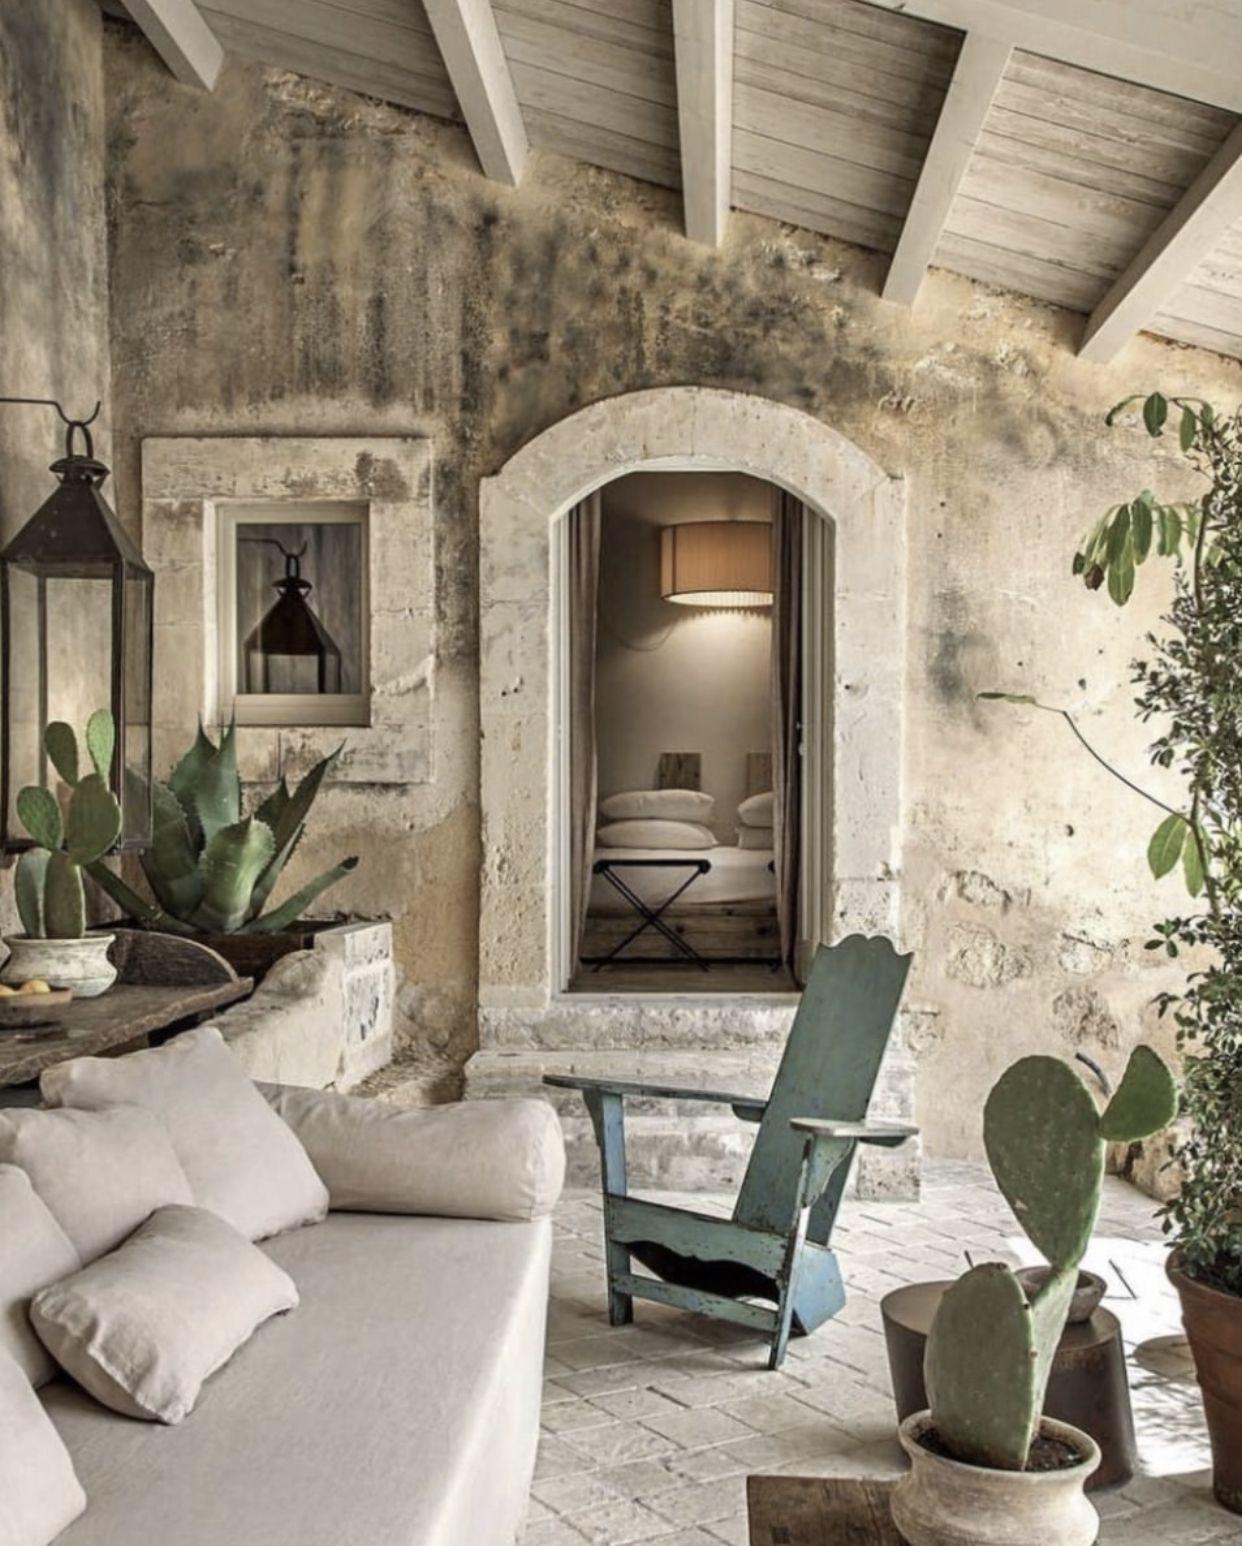 Melissehome On Instagram Home Garden Living The Good Life Inspo Interiordesign Plants Gardening Interior Design Rustic Rustic Interiors House Design